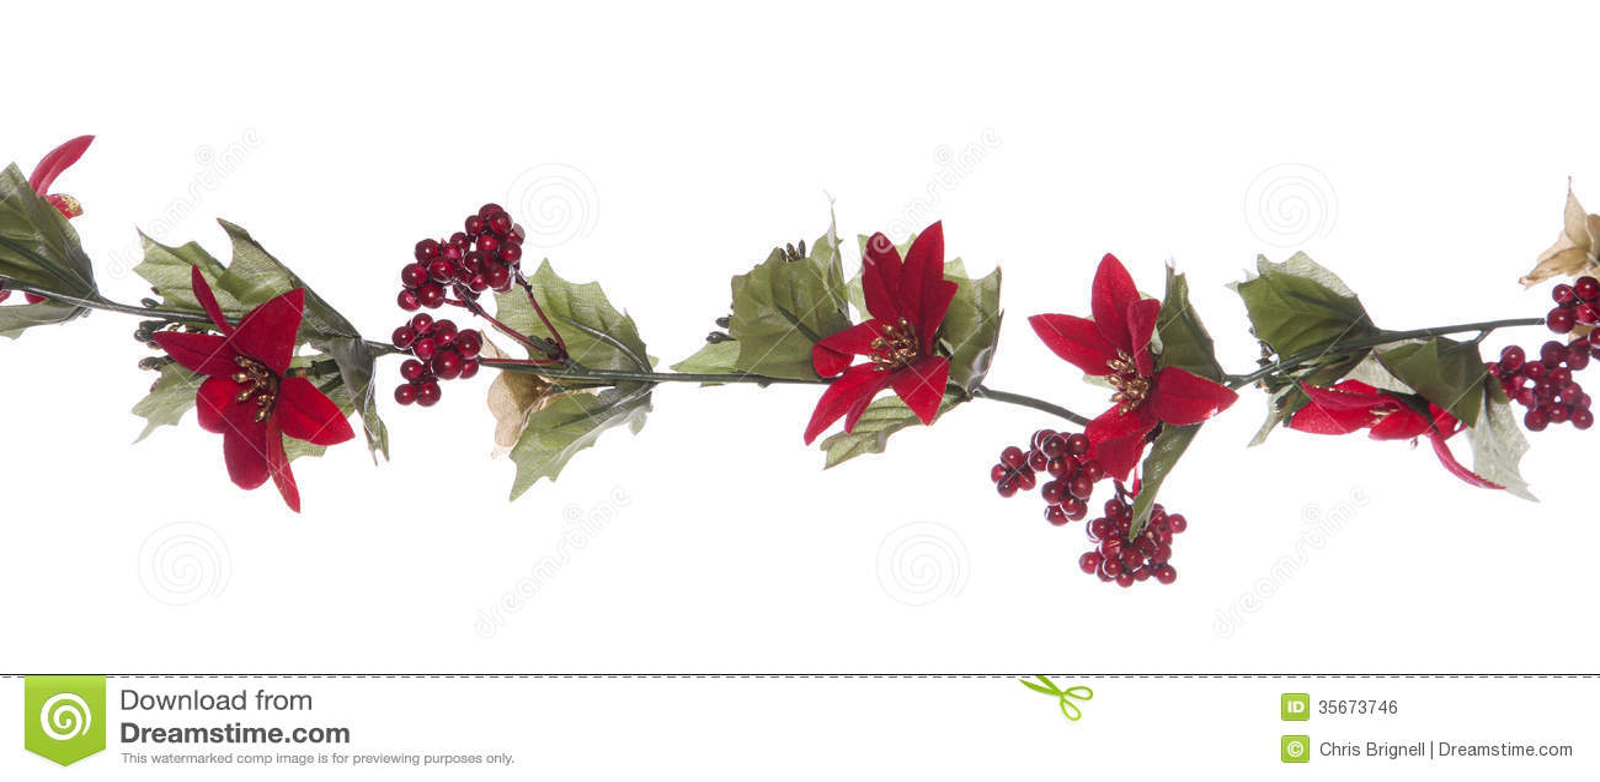 Christmas Garland Border Royalty Free Stock Image - Image: 35673746